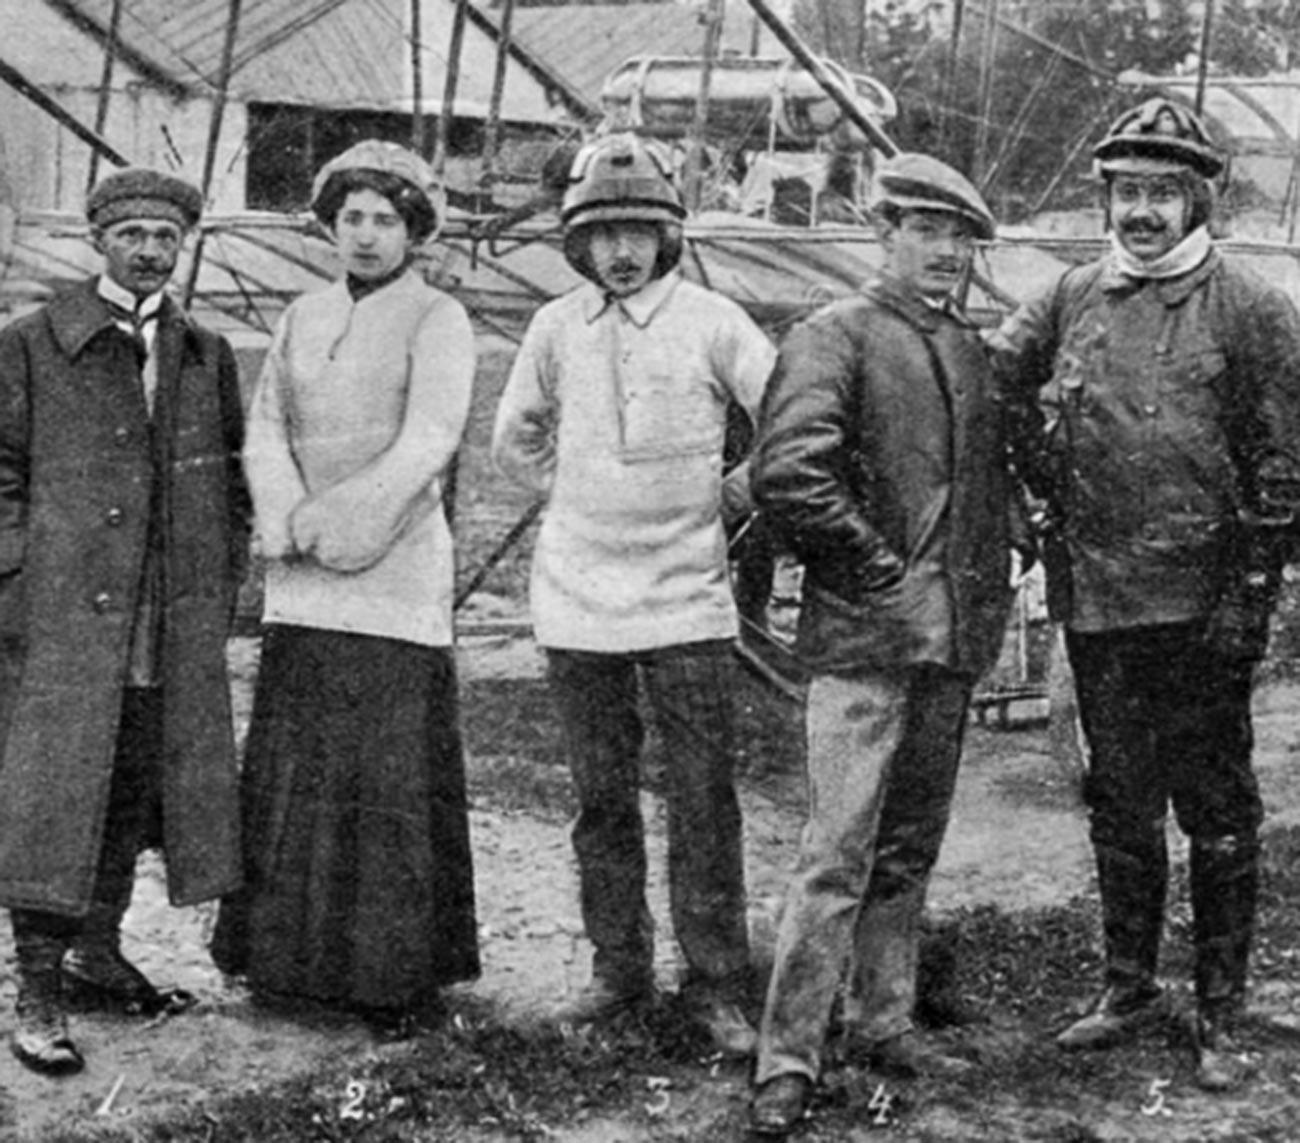 Lidia Zvéreva con cadetes e instructores de la escuela de vuelo Gamayún en un aeródromo de Gátchina. 1910.